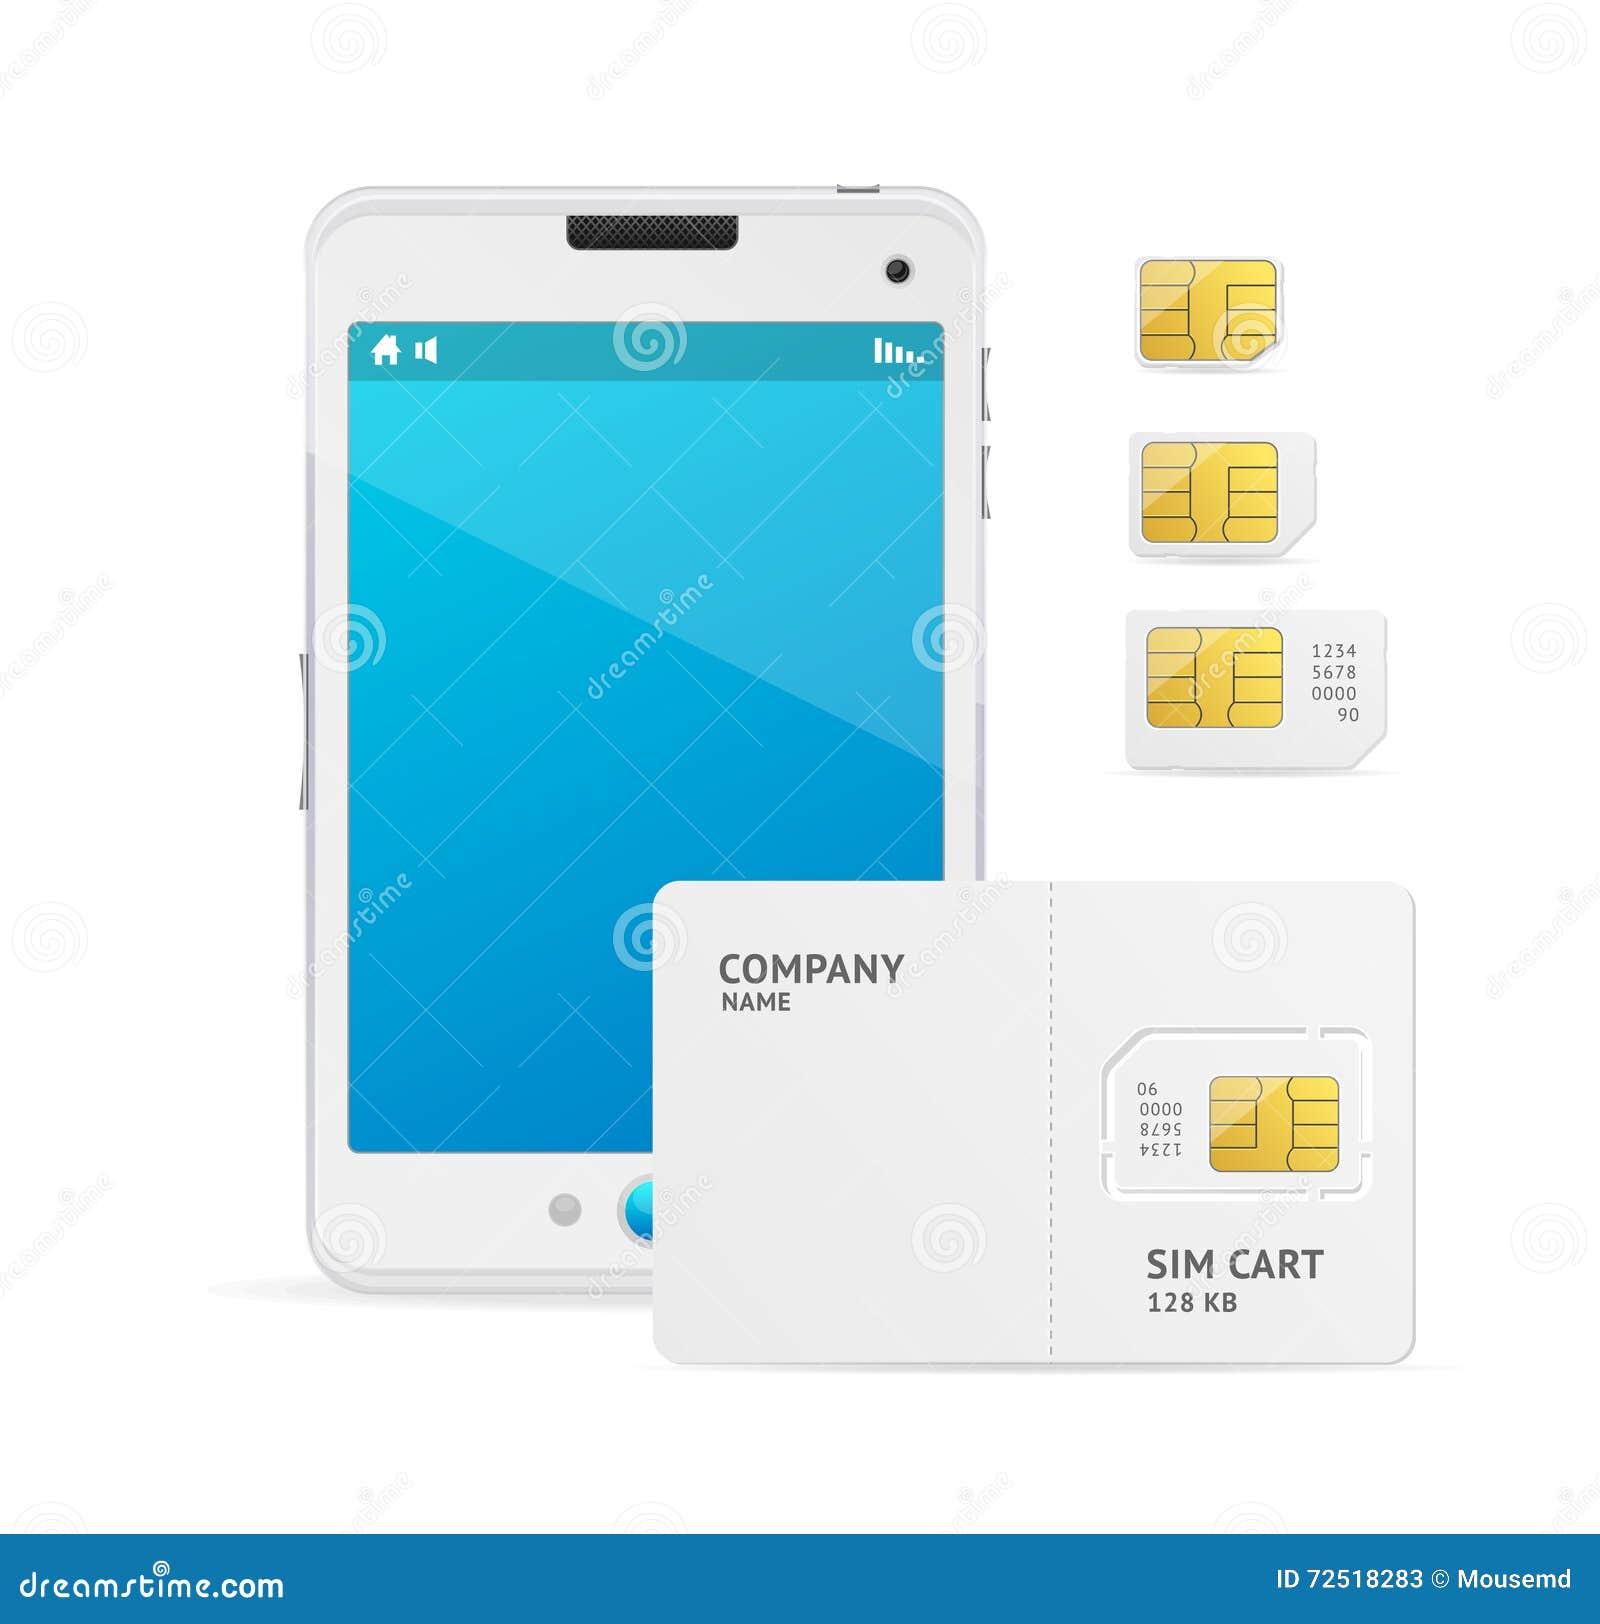 Sim Card Template | Telefon Sim Card Template Vektor Vektor Abbildung Illustration Von